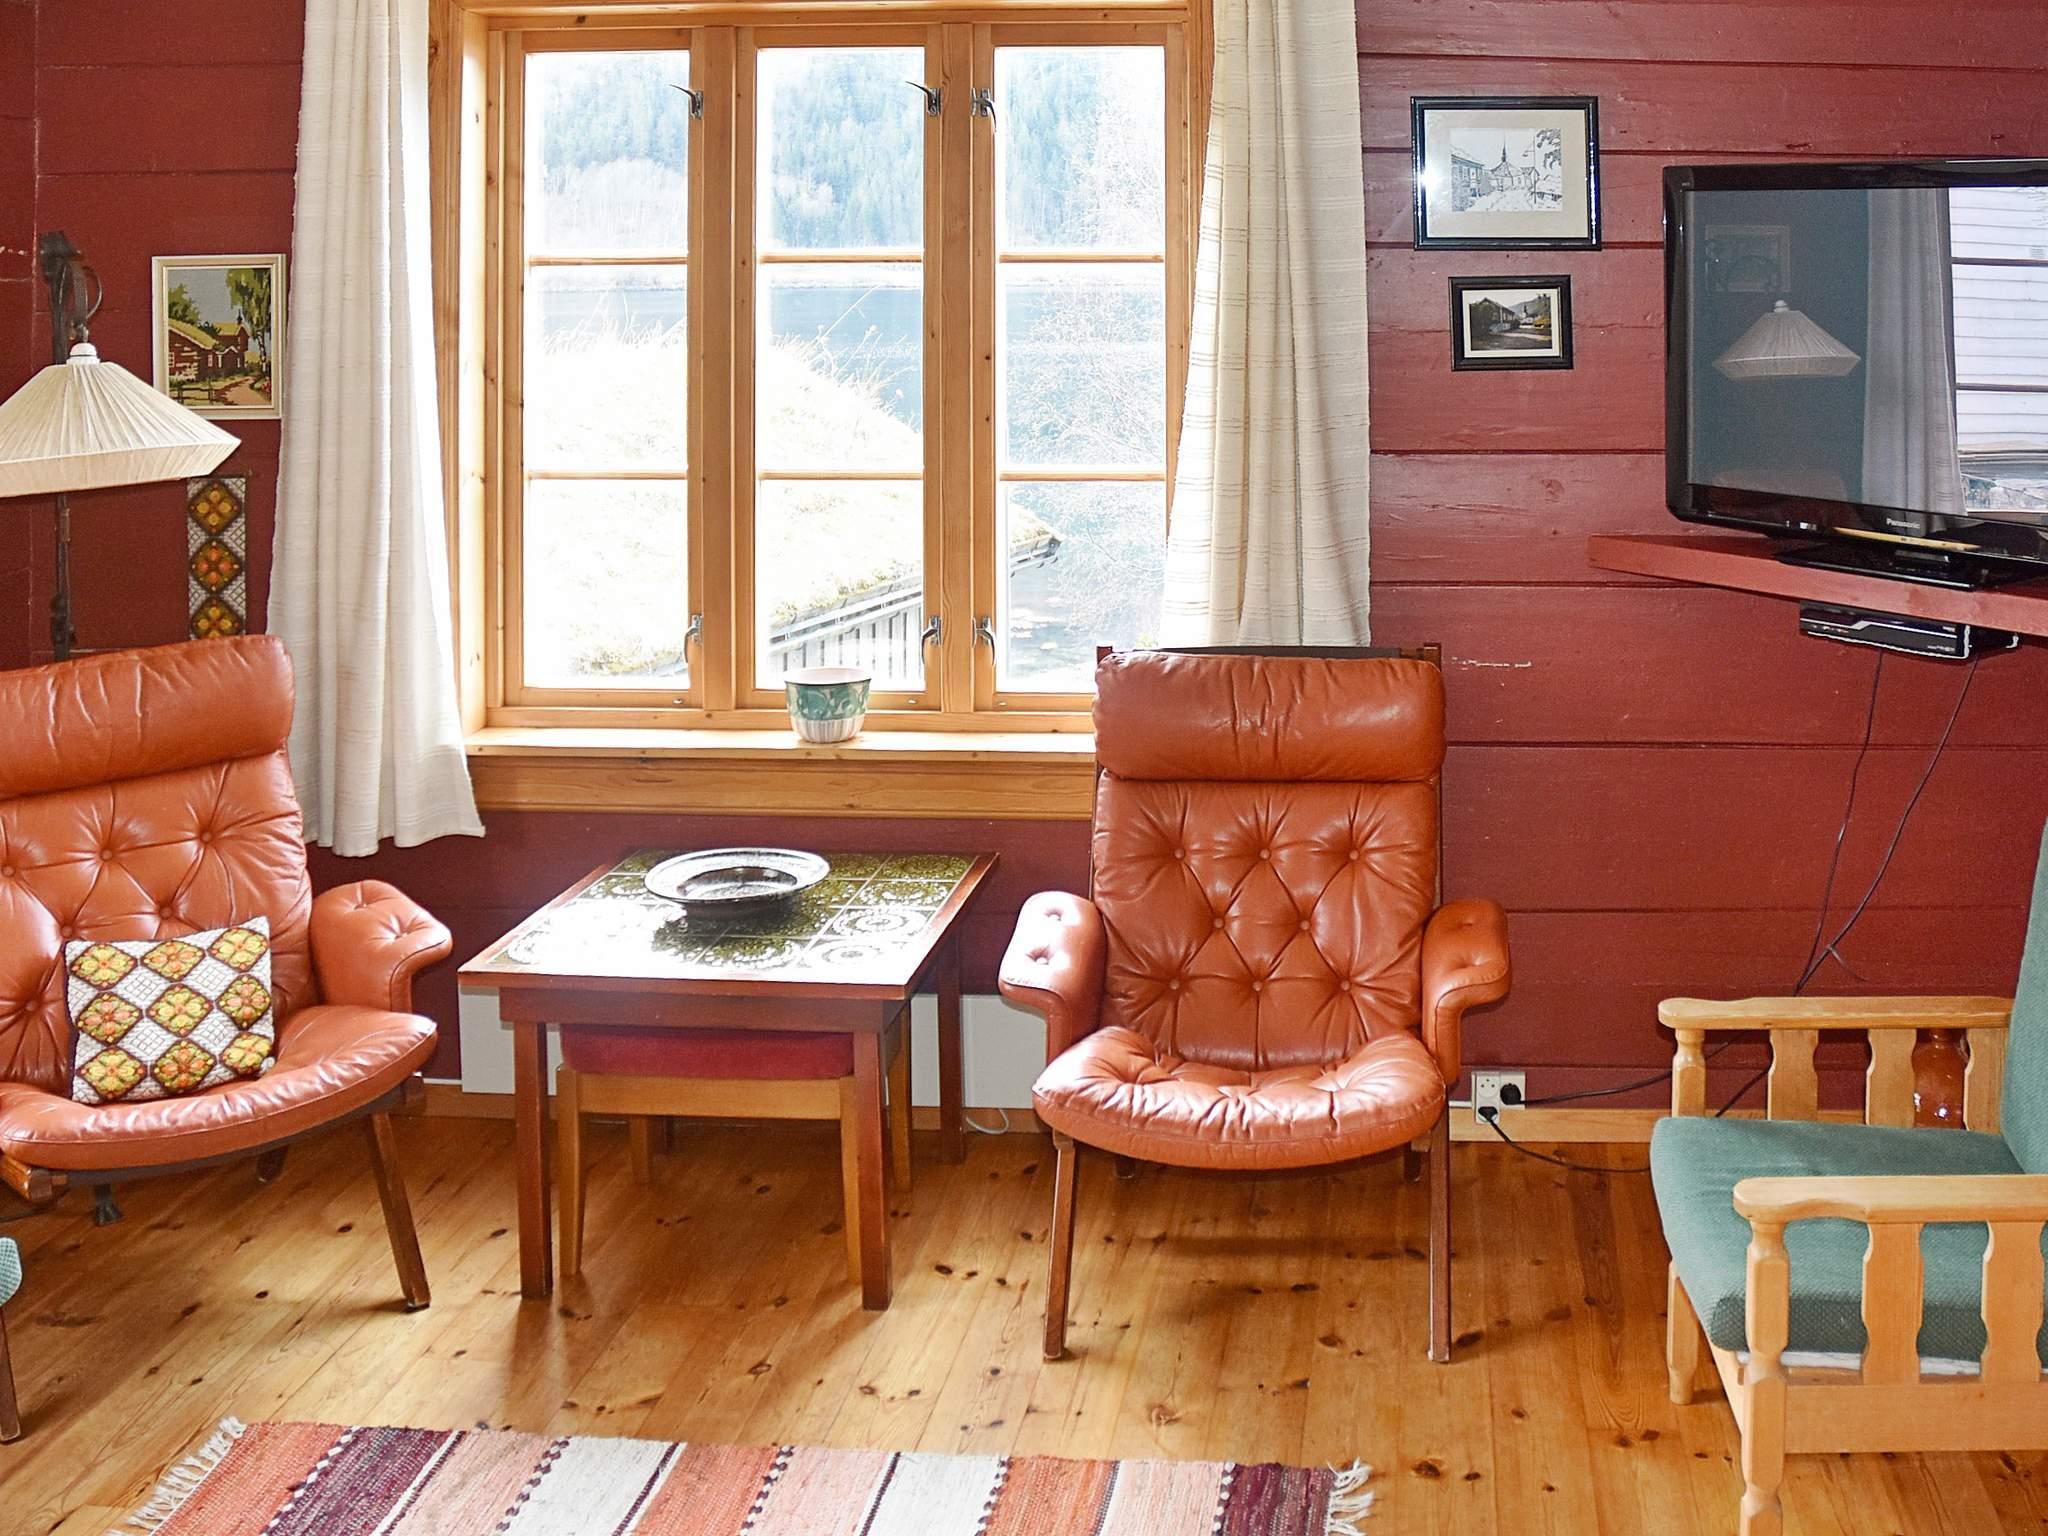 Ferienhaus Norddal (85061), Norddal, More - Romsdal, Westnorwegen, Norwegen, Bild 4